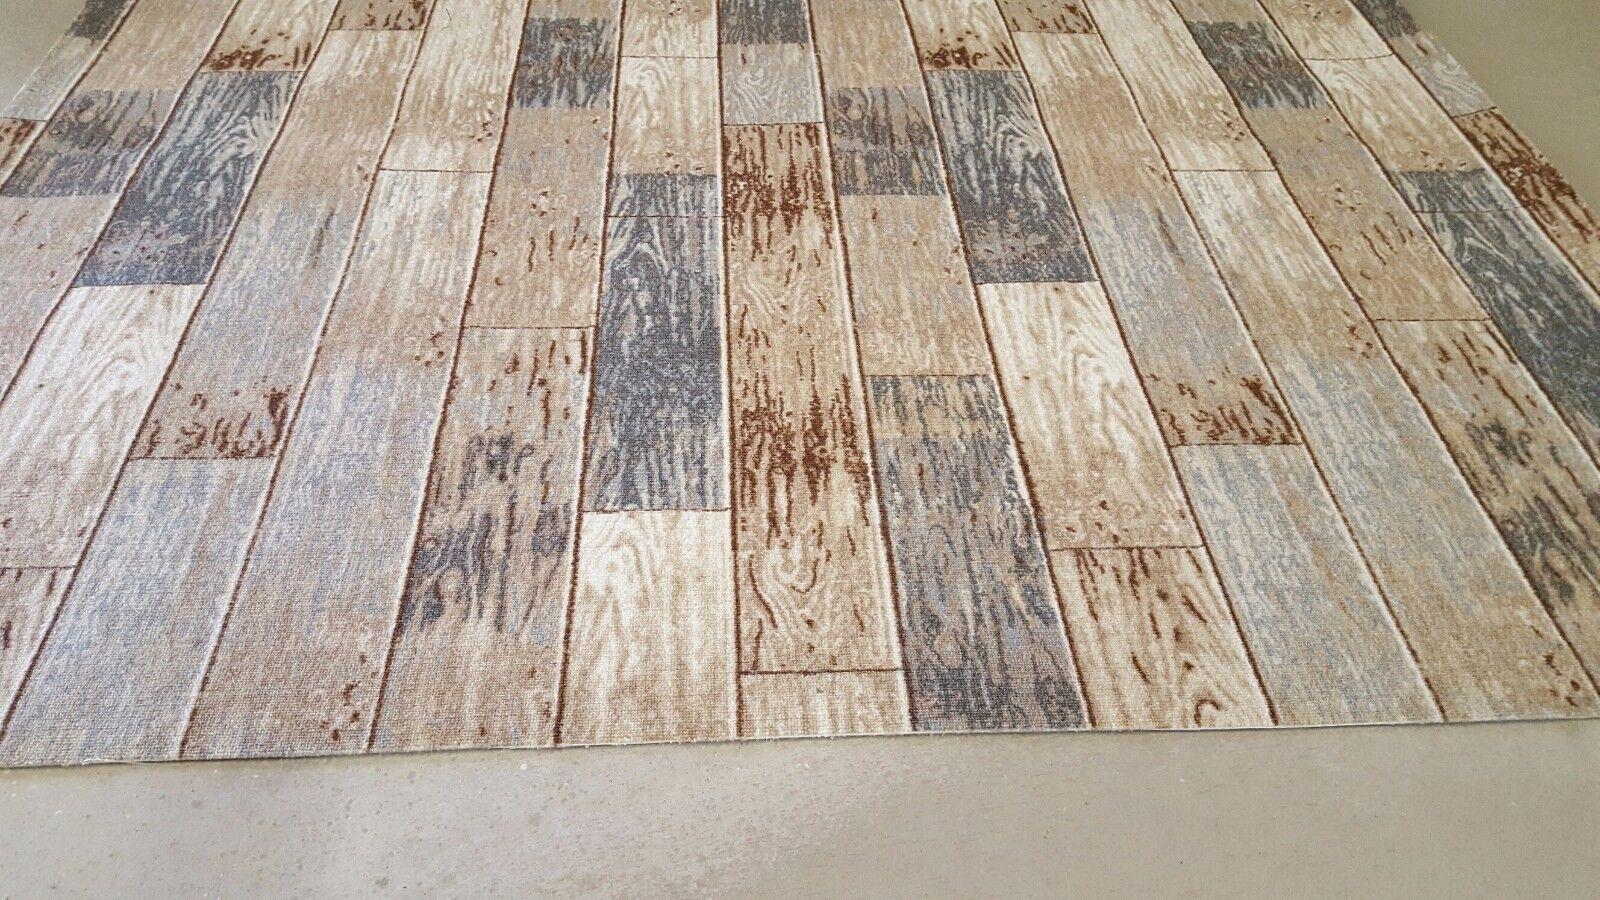 Teppichboden MUSTER Design Holz Planken Auslegware 400 cm